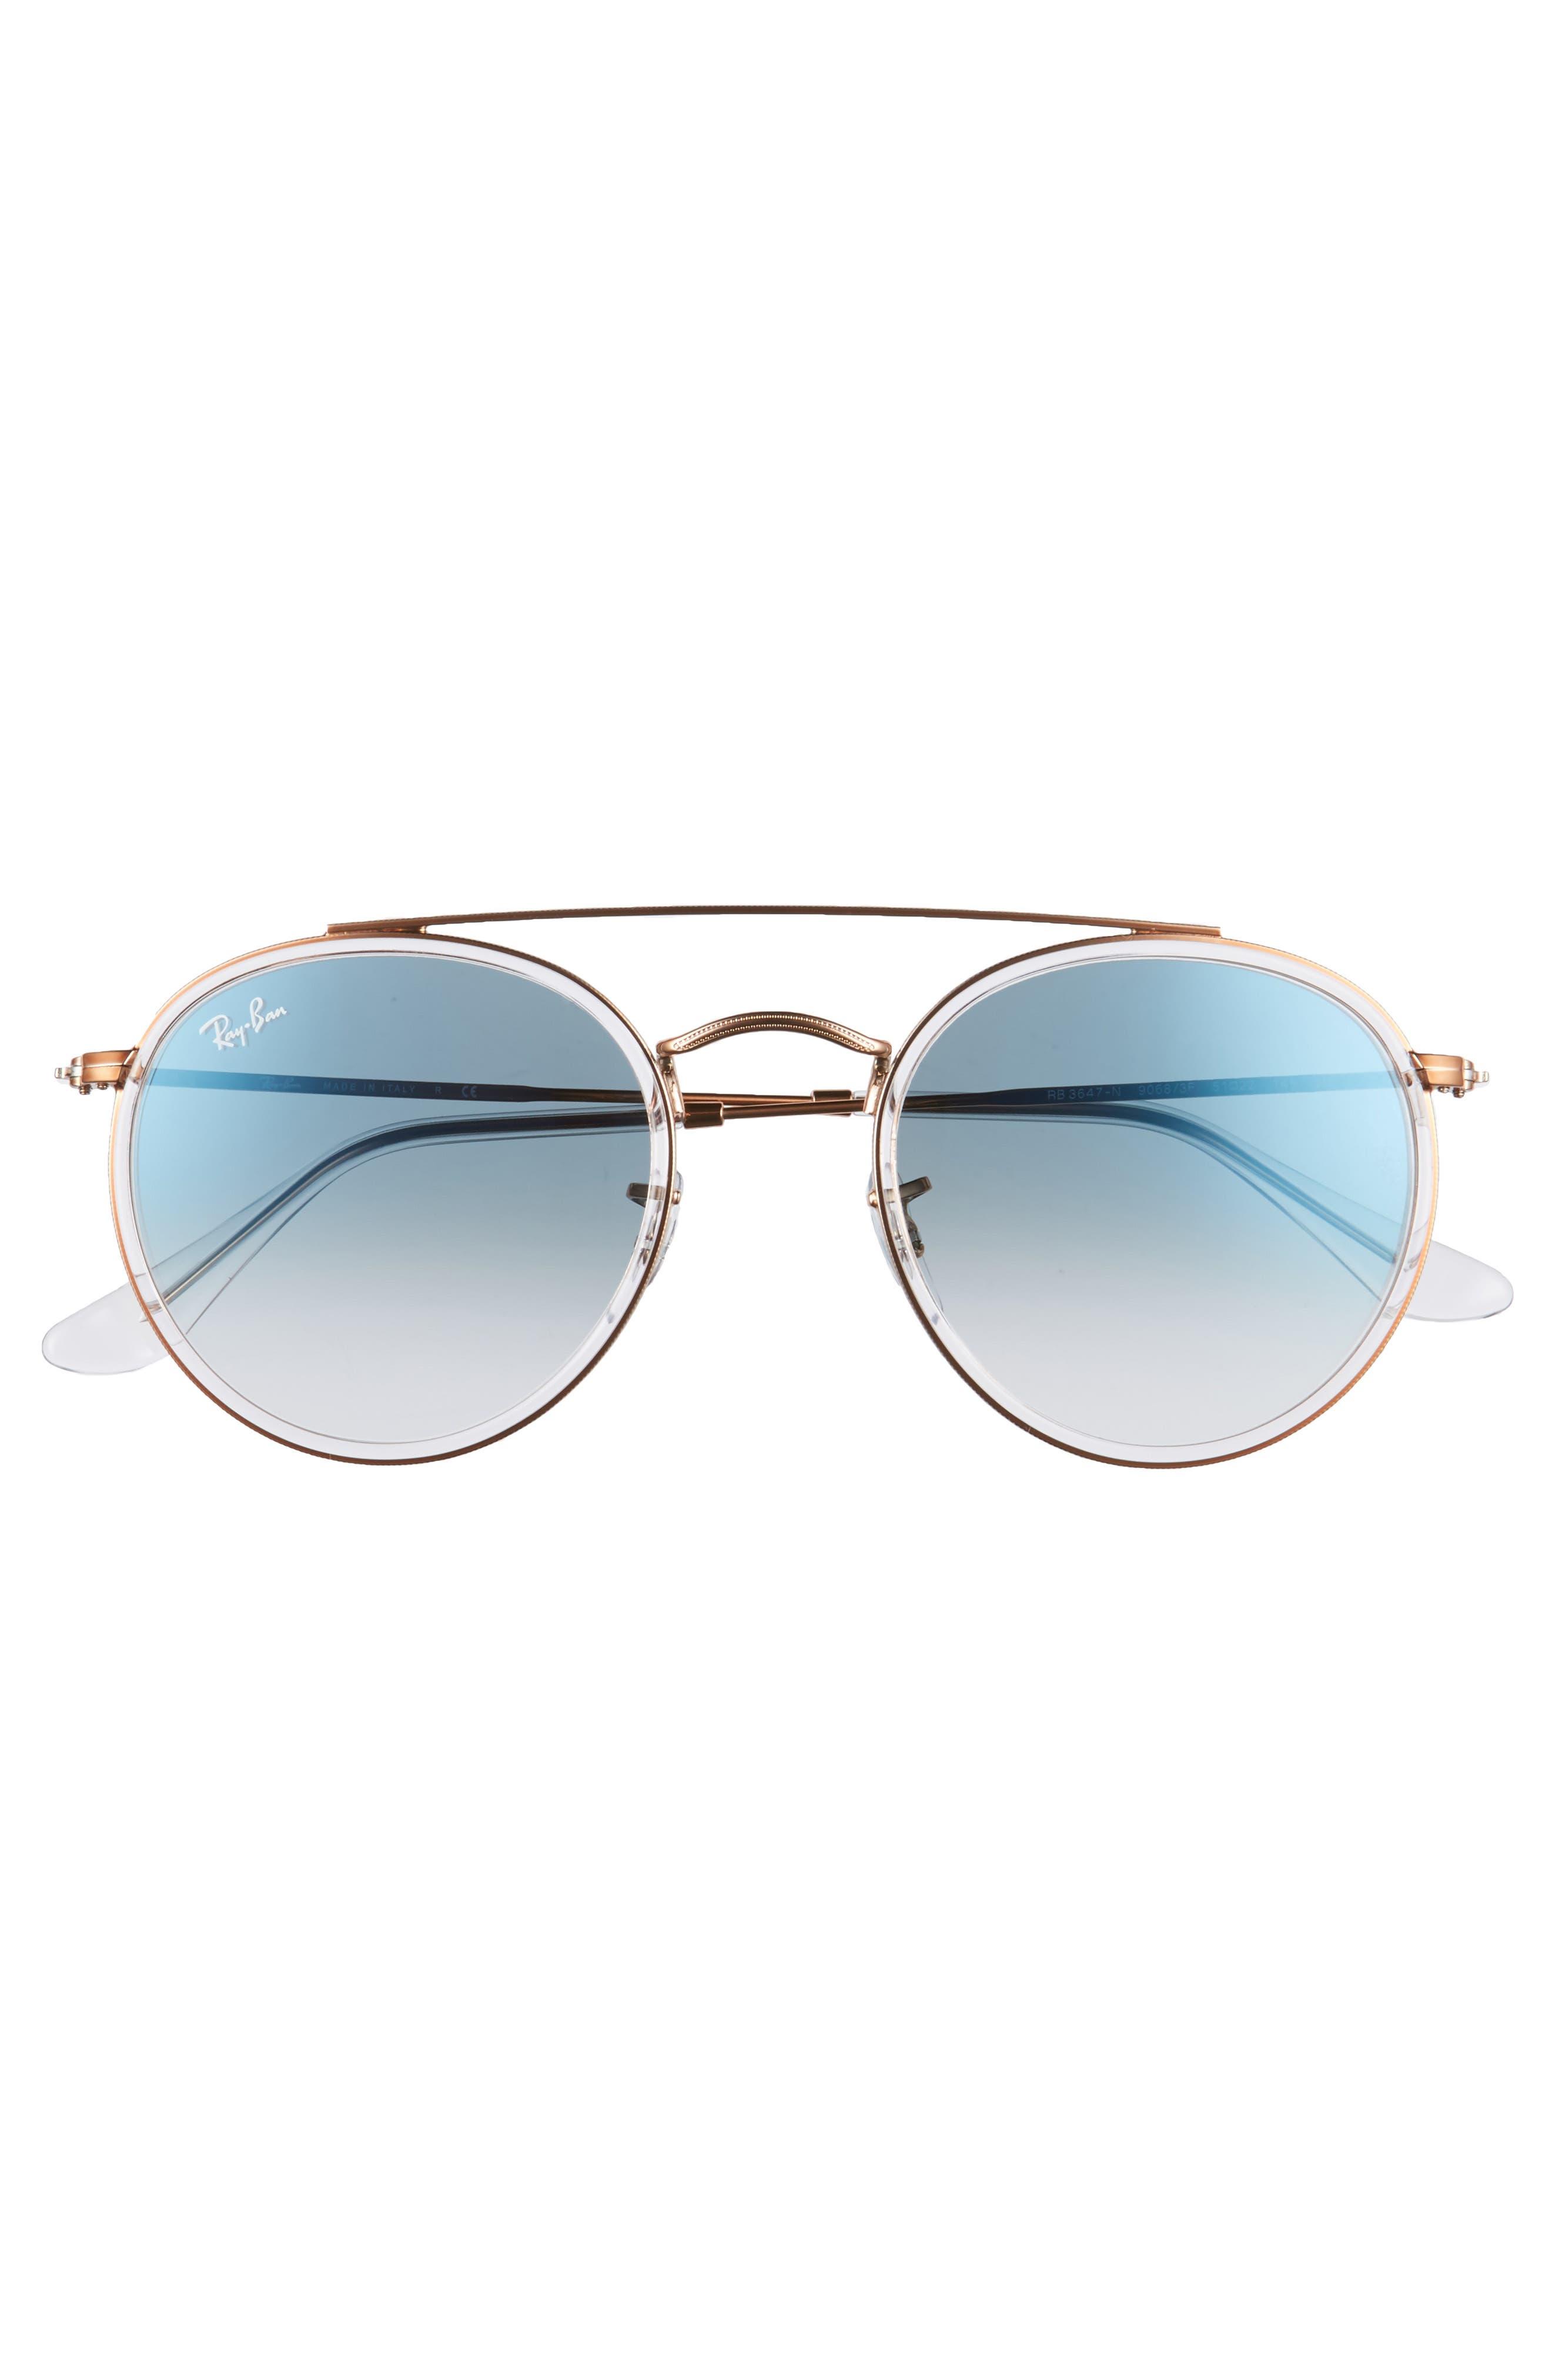 51mm Aviator Gradient Lens Sunglasses,                             Alternate thumbnail 3, color,                             Blue Transparent